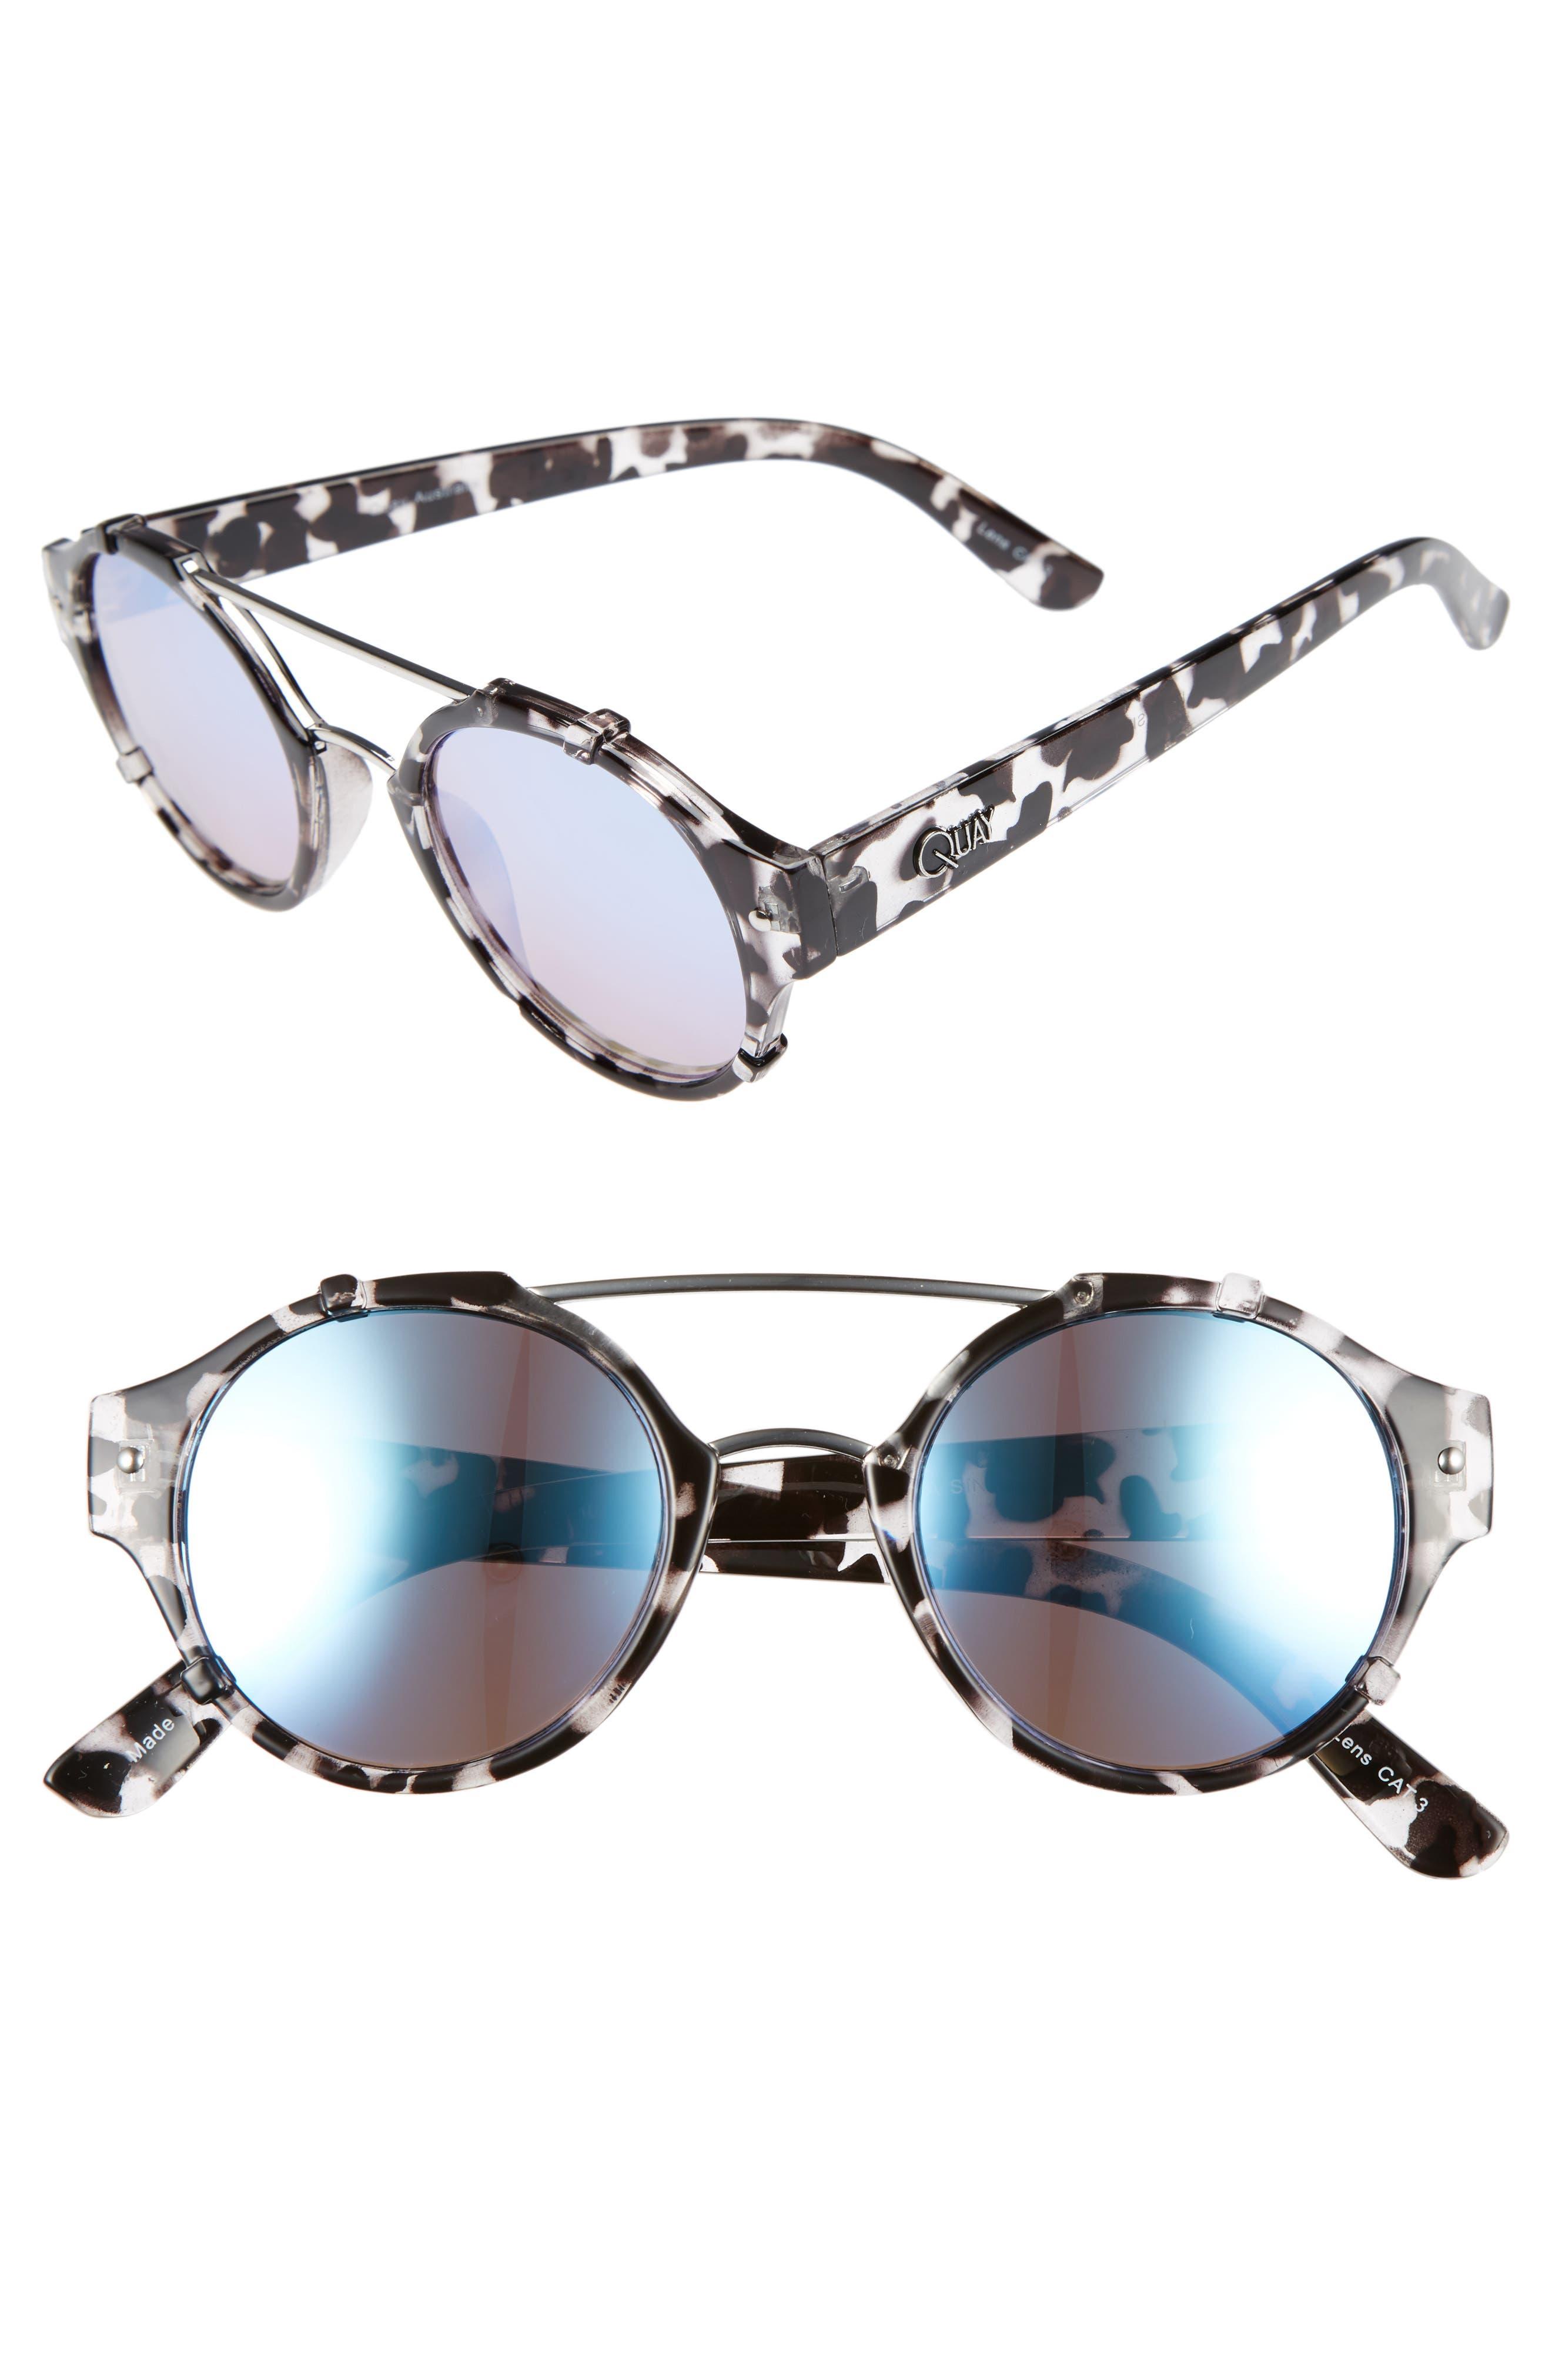 Quay Australia It's a Sin 49mm Mirrored Round Sunglasses